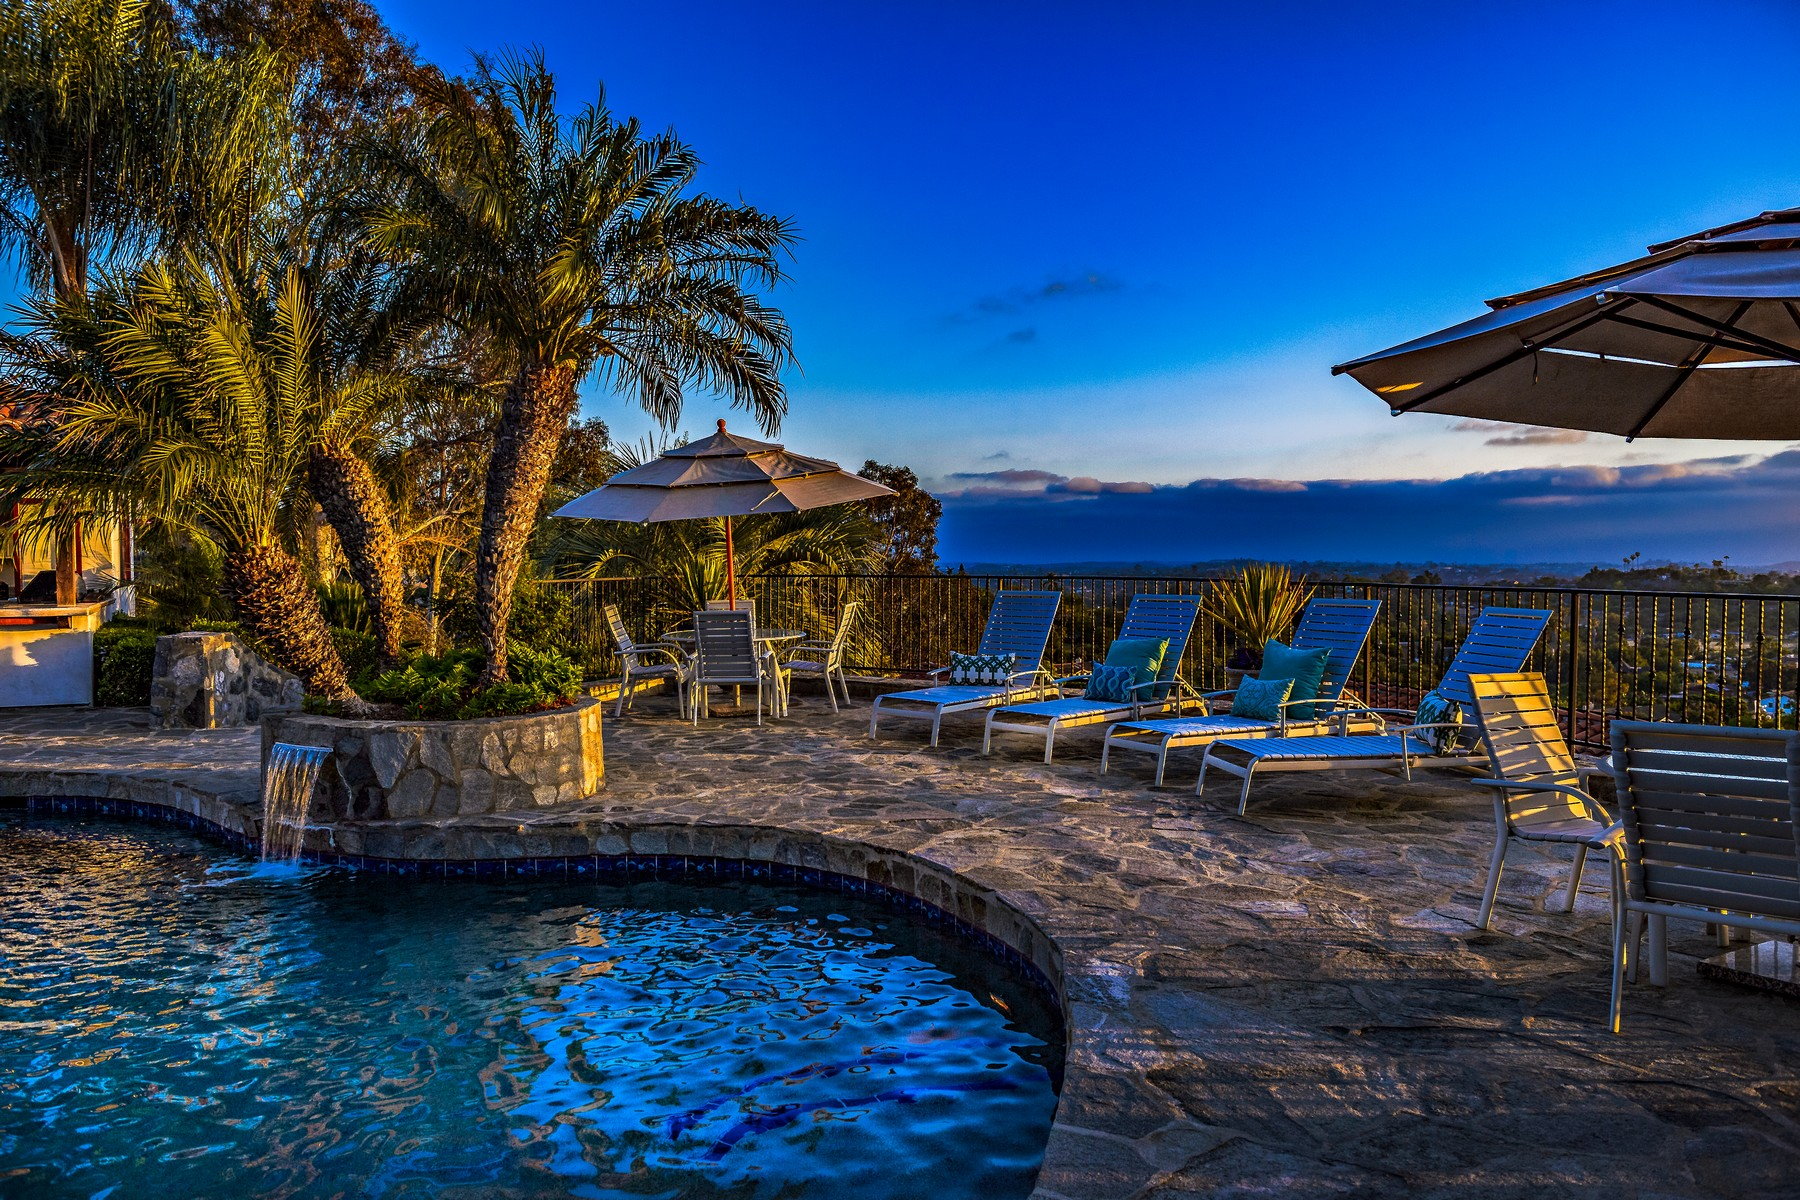 Single Family Homes for Sale at 2465 Catalina Avenue Vista, California 92084 United States